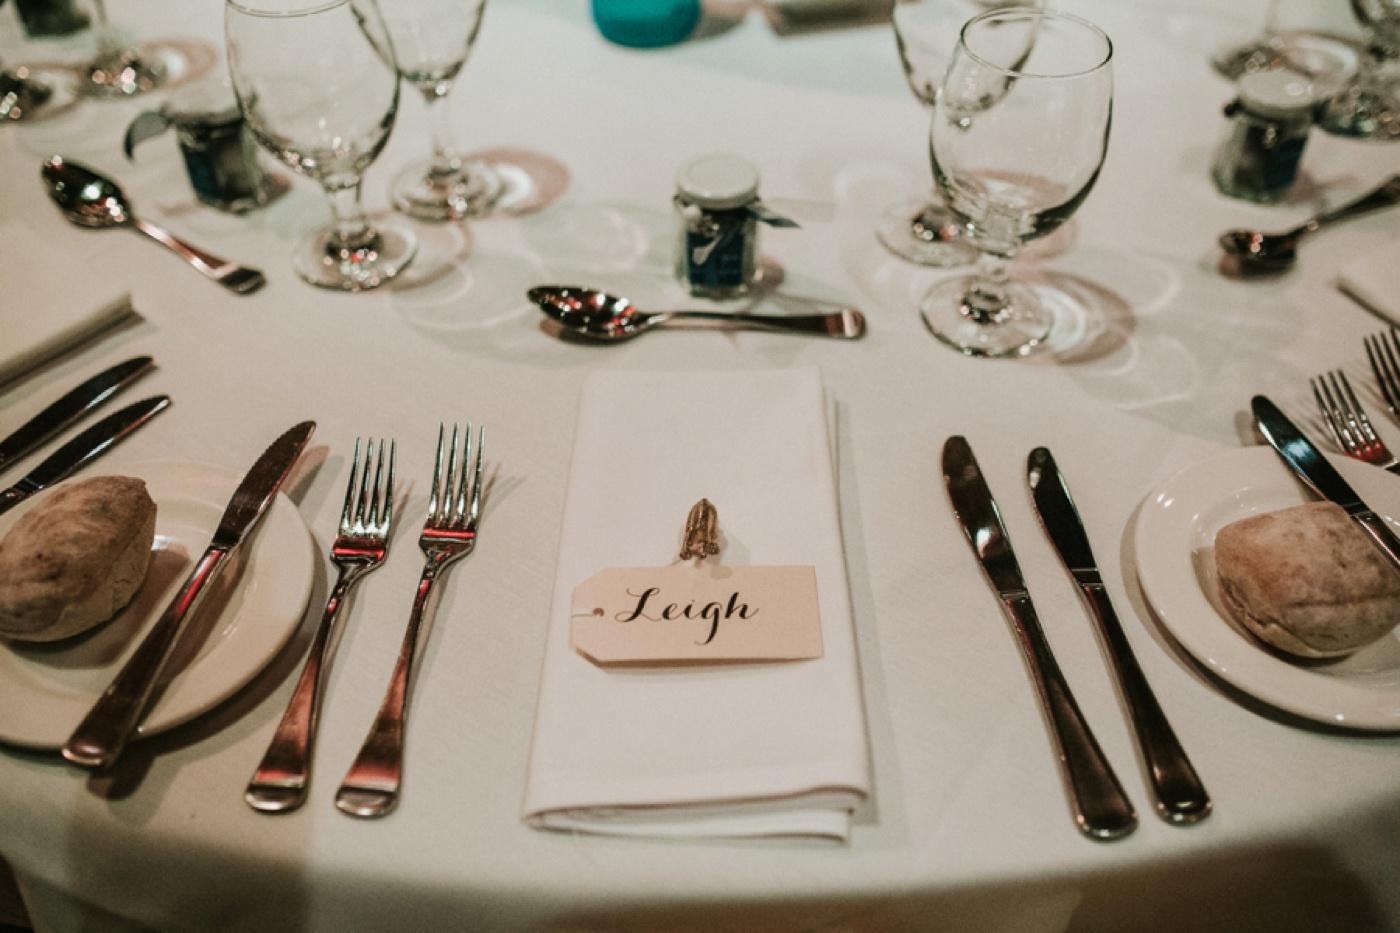 anitadaniel_melbourne-scienceworks-relaxed-fun-geek-wedding_melbourne-candid-wedding-photography_69